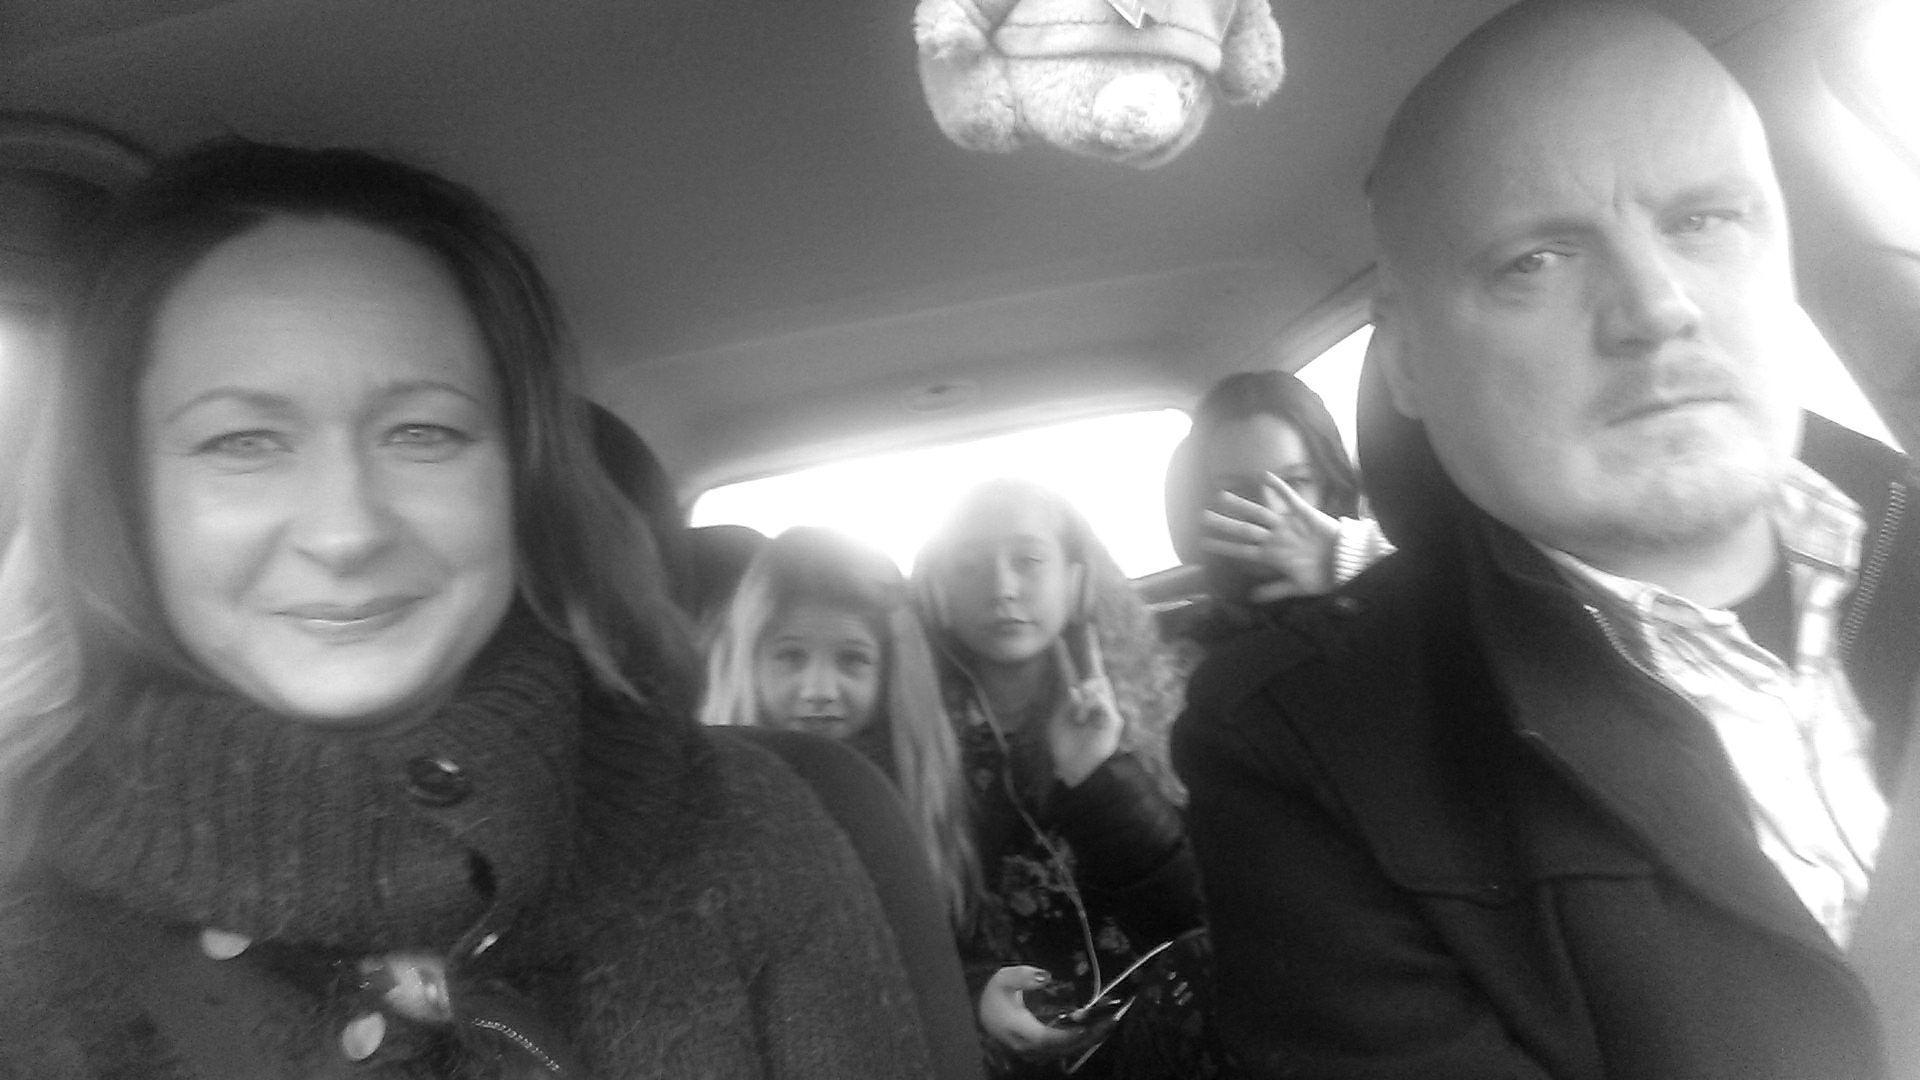 #perhe #lapset #vanhemmat